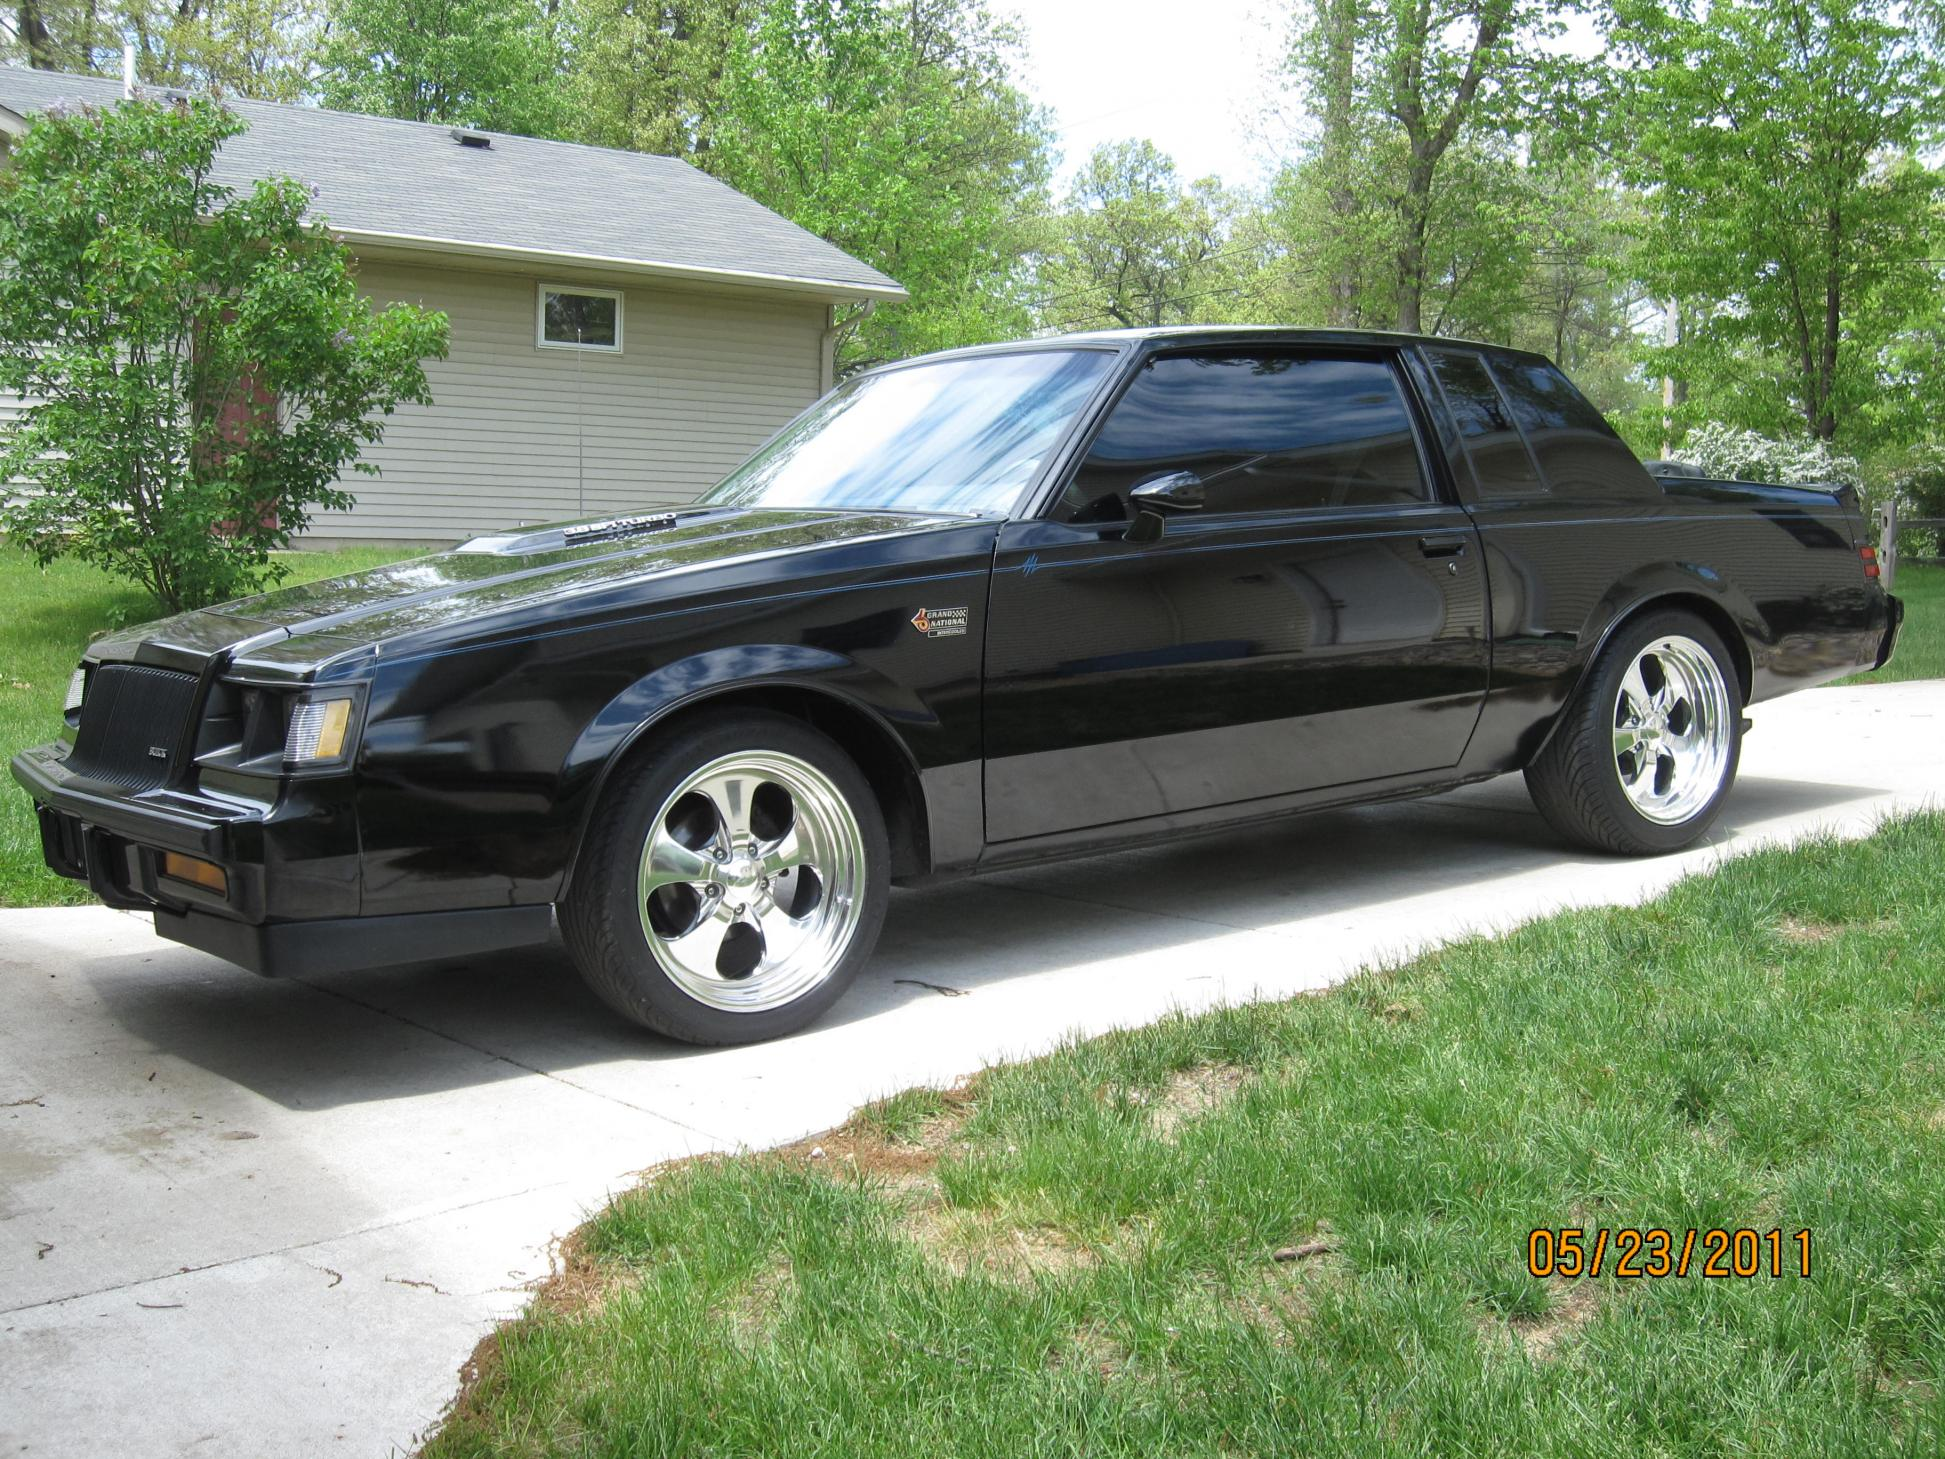 87 buick gnx for sale autos post. Black Bedroom Furniture Sets. Home Design Ideas